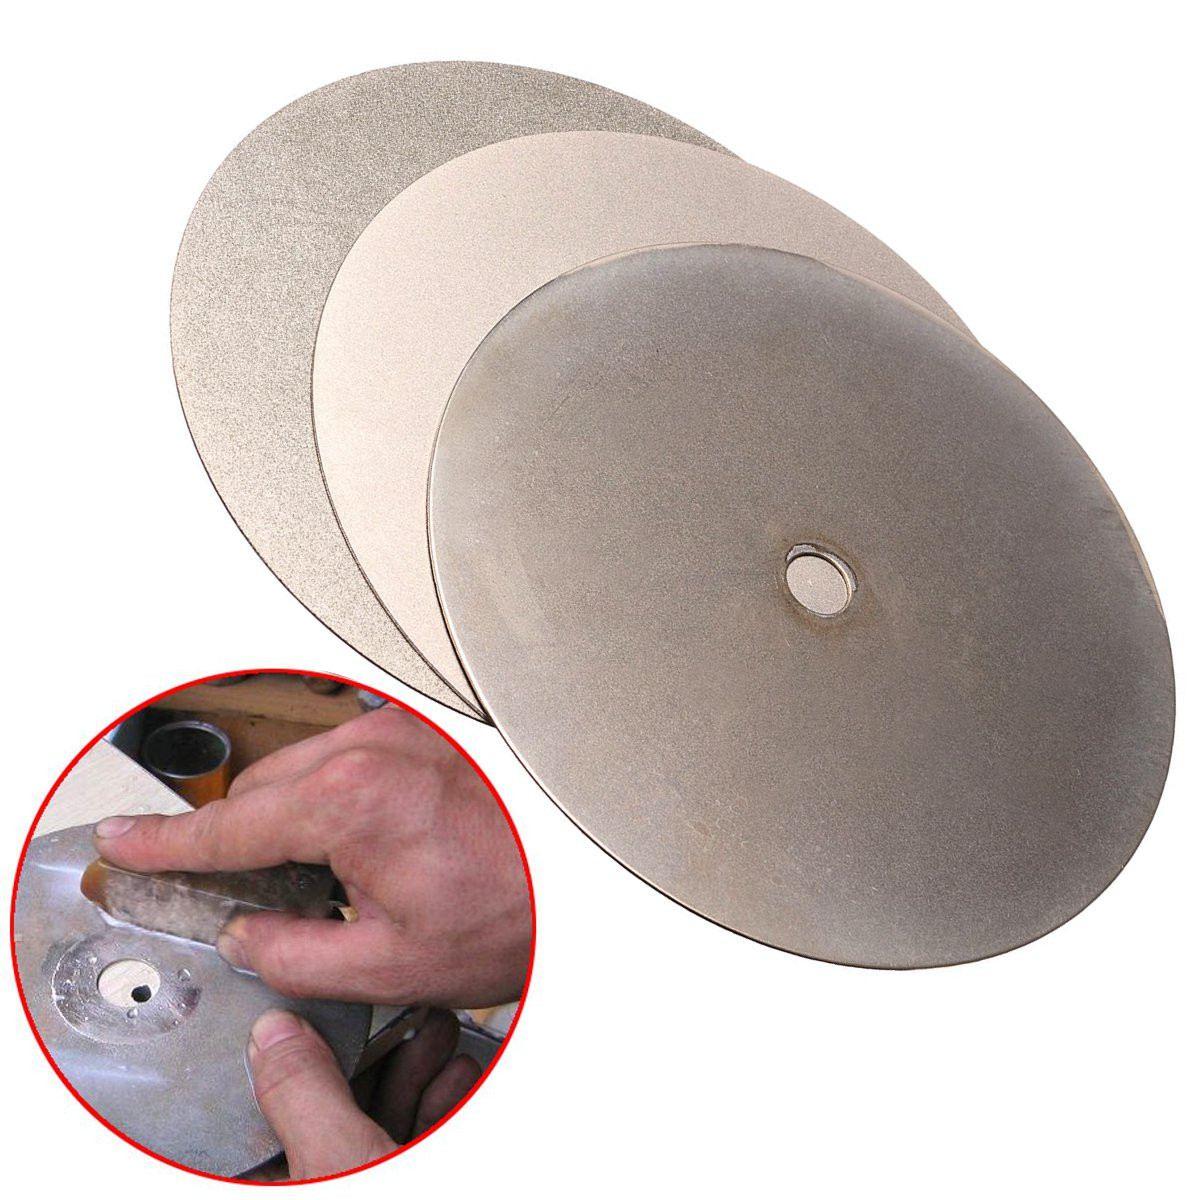 New 3Pcs 150mm 6 Inch Diamond Grinding Wheel Grit 240# 600# 3000# Flat Lap Disk Wheel Grinding Pad Tool Power Tool Accessories